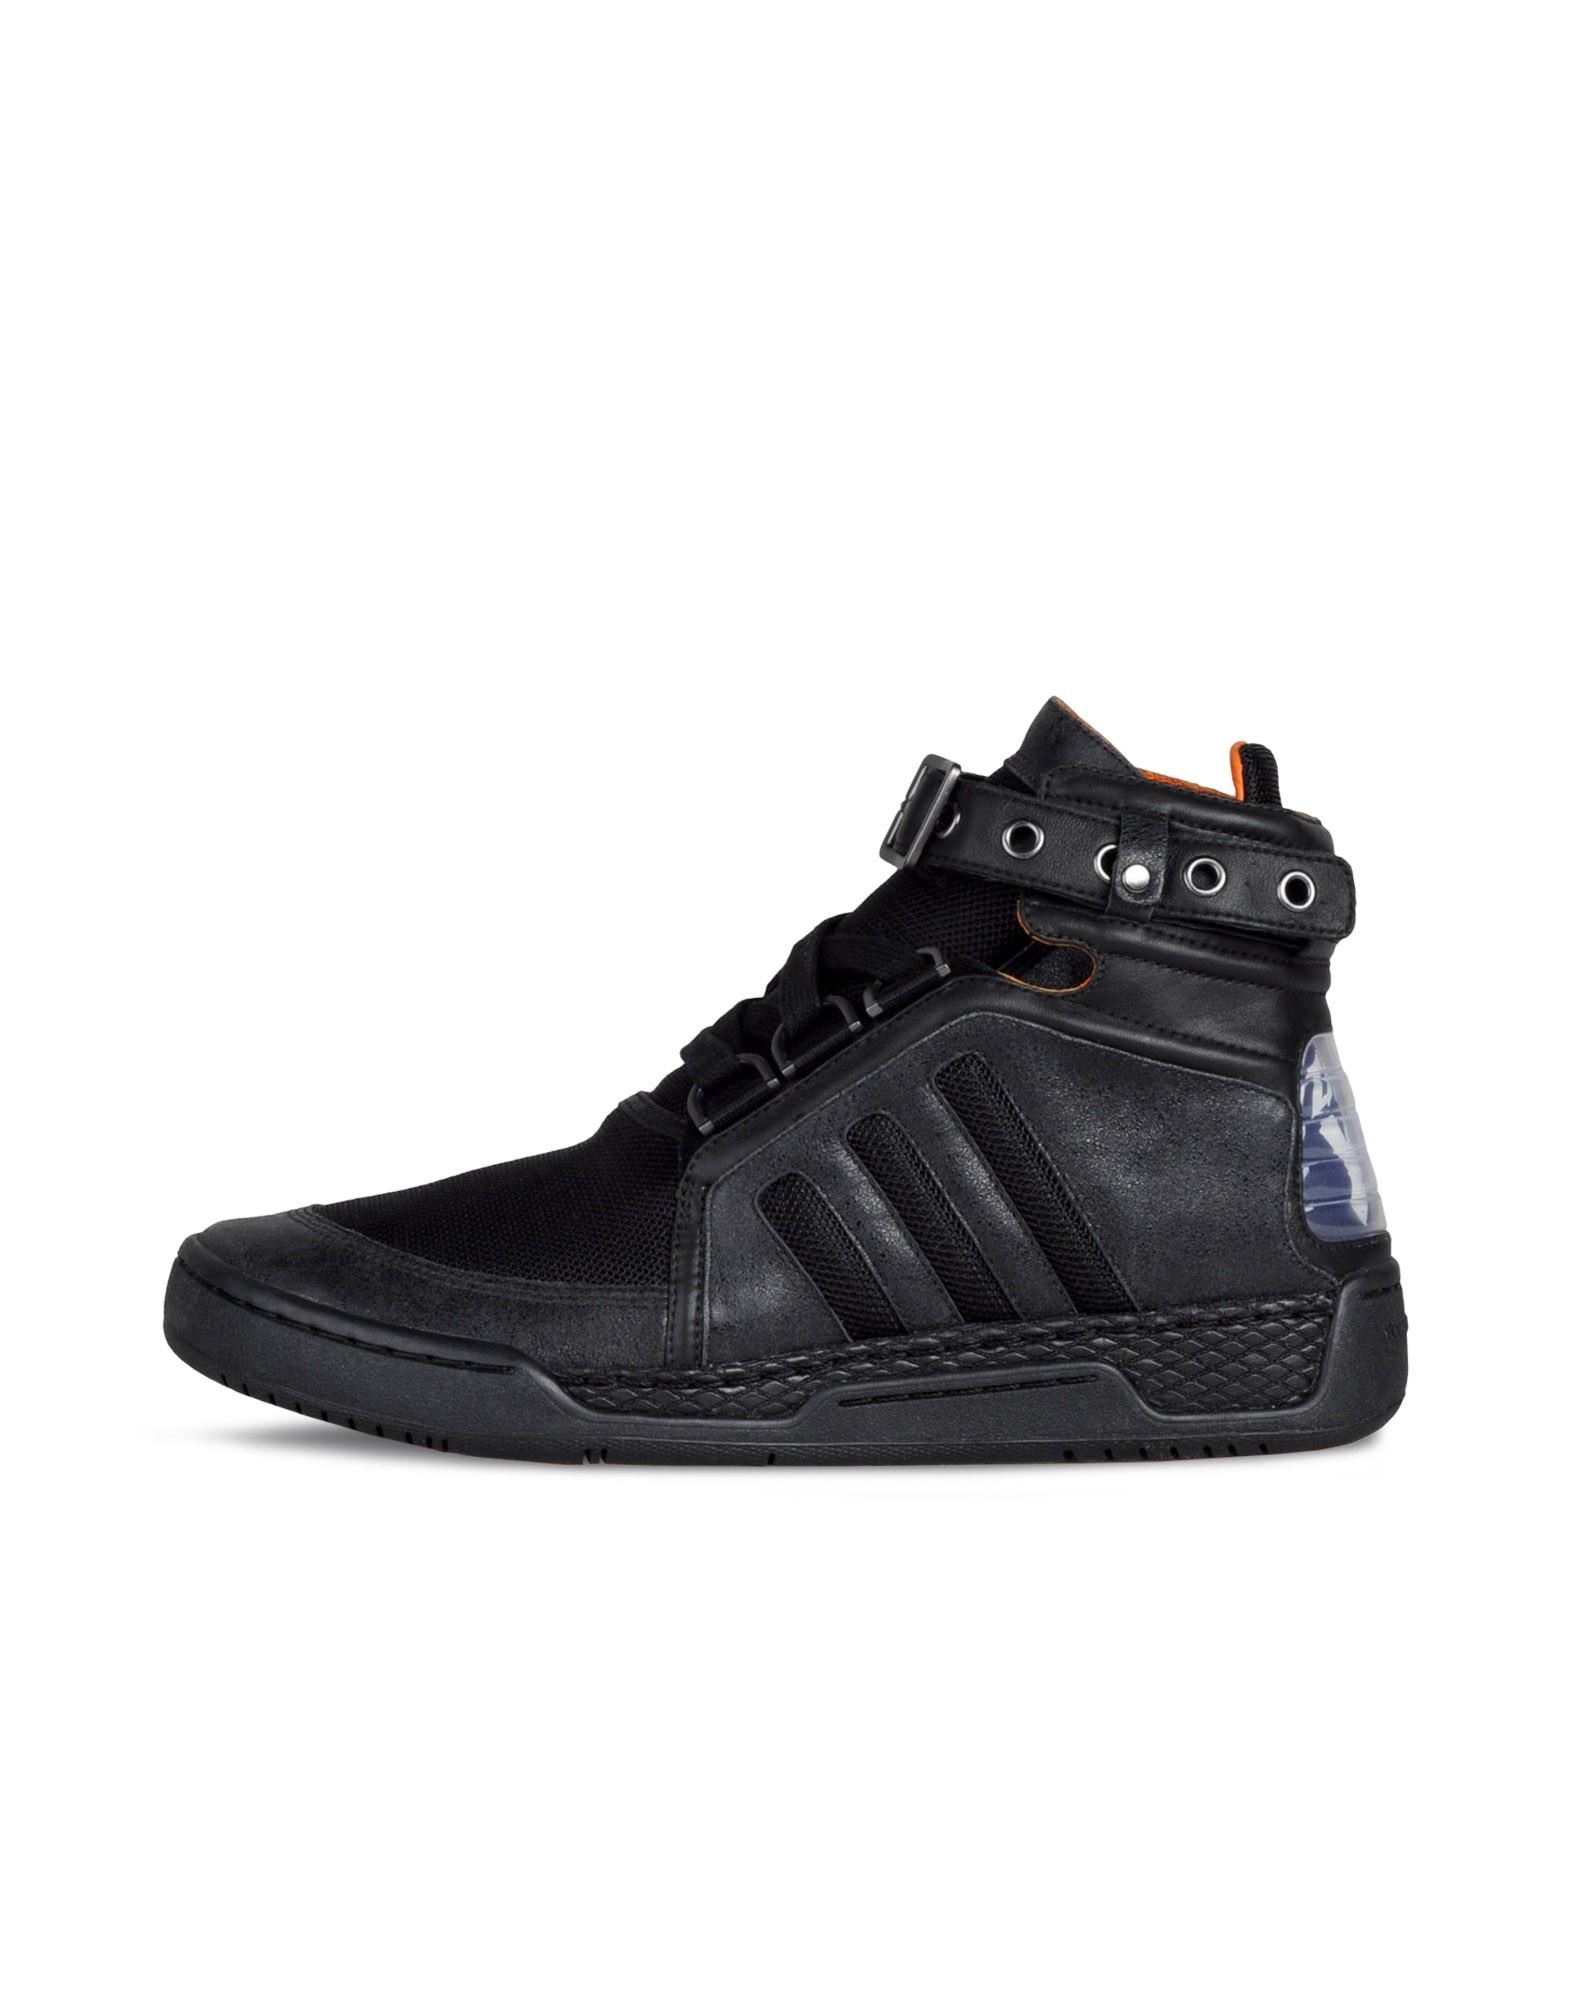 ... Y-3 Y-3 Hayworth 2 Mid High-top sneakers Man f ... 1a21b6e8e855